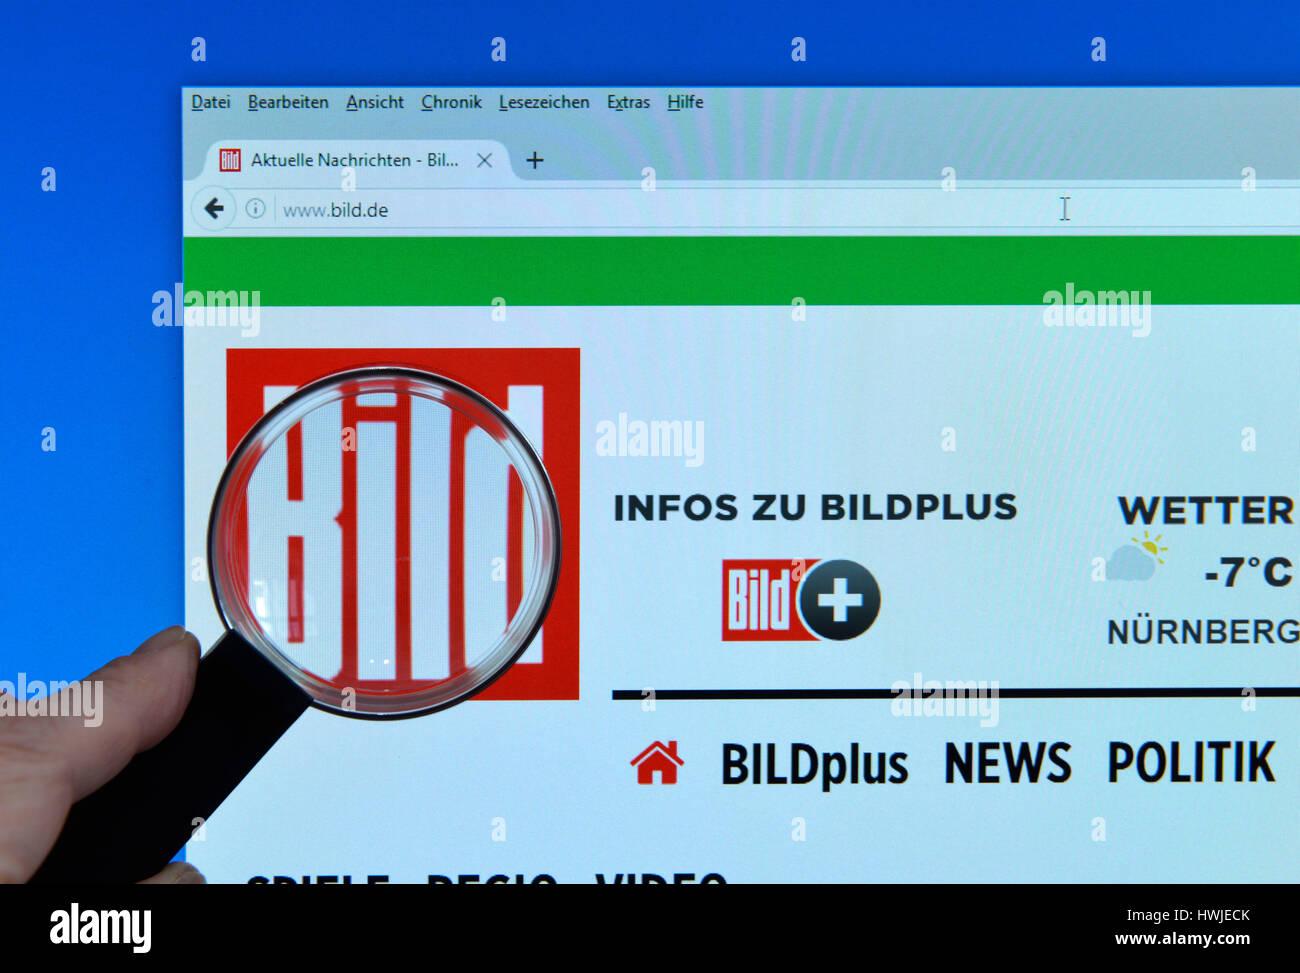 Bild, Website, Internet, Bildschirm, Lupe, Hand - Stock Image